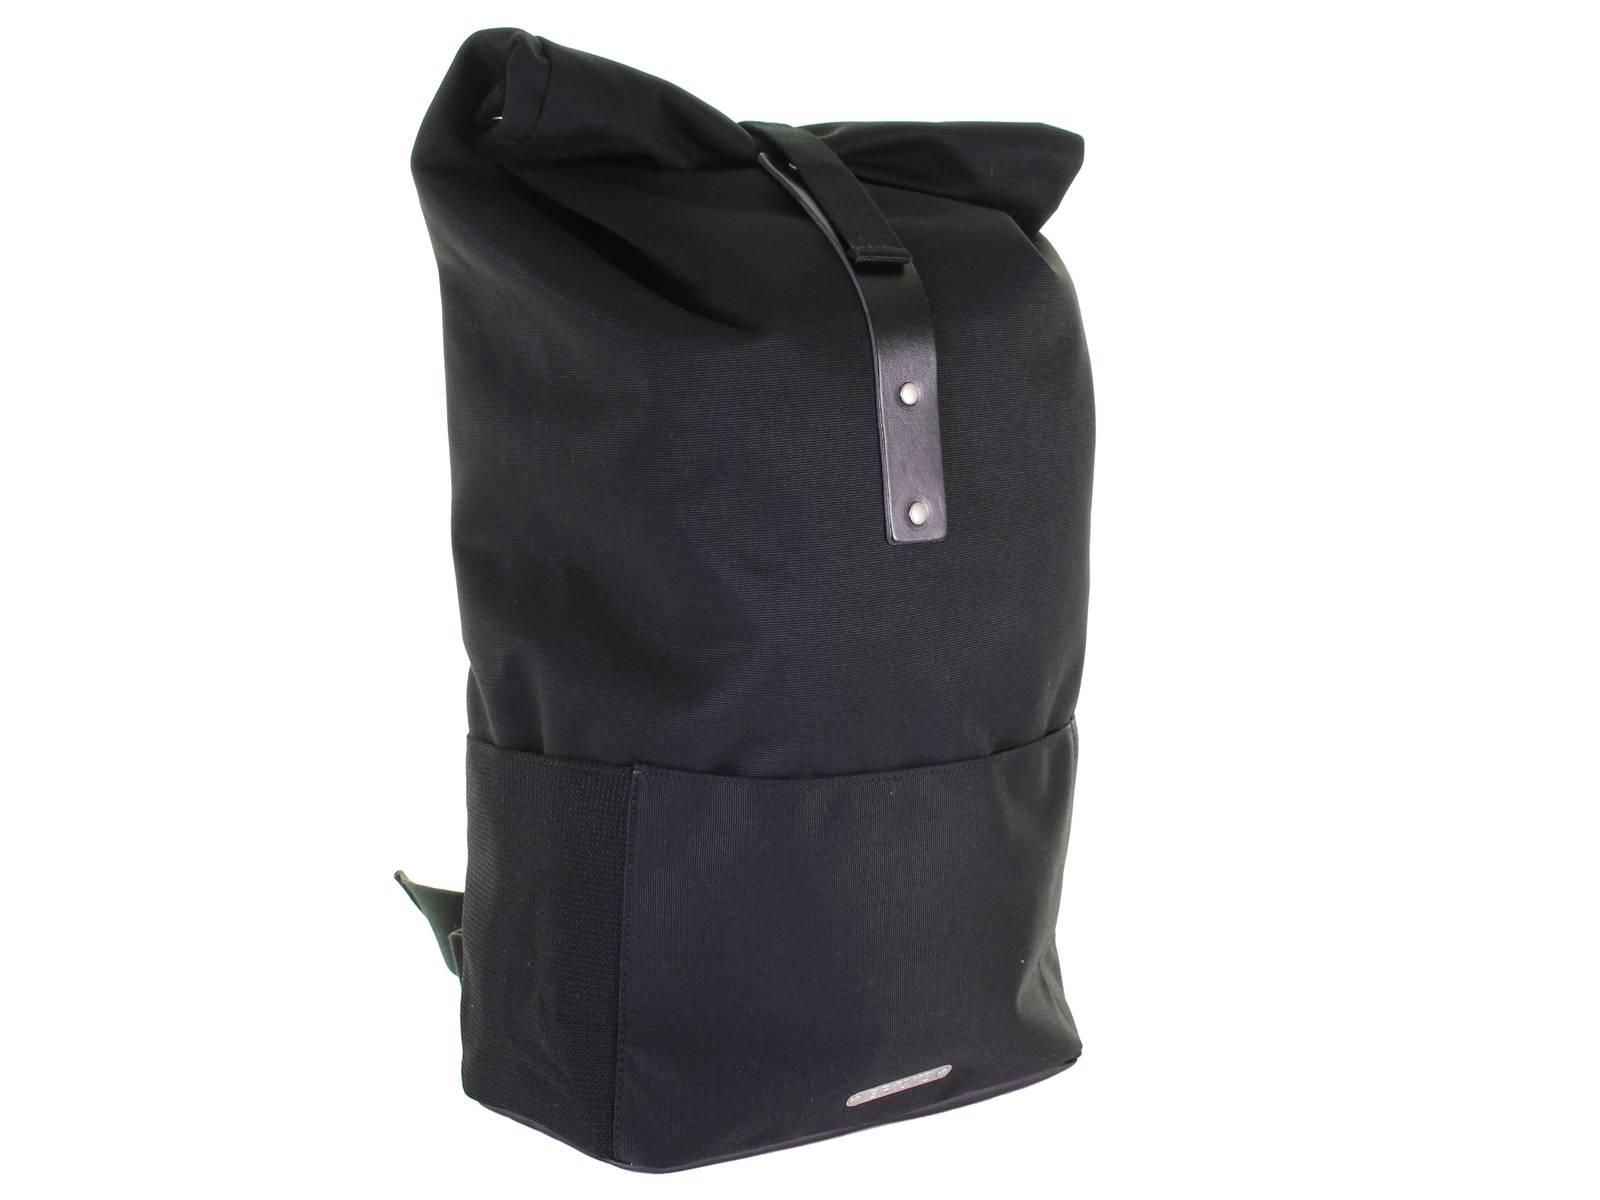 brooks fahrradtasche rucksack hackney schwarz fahrradkomfort. Black Bedroom Furniture Sets. Home Design Ideas